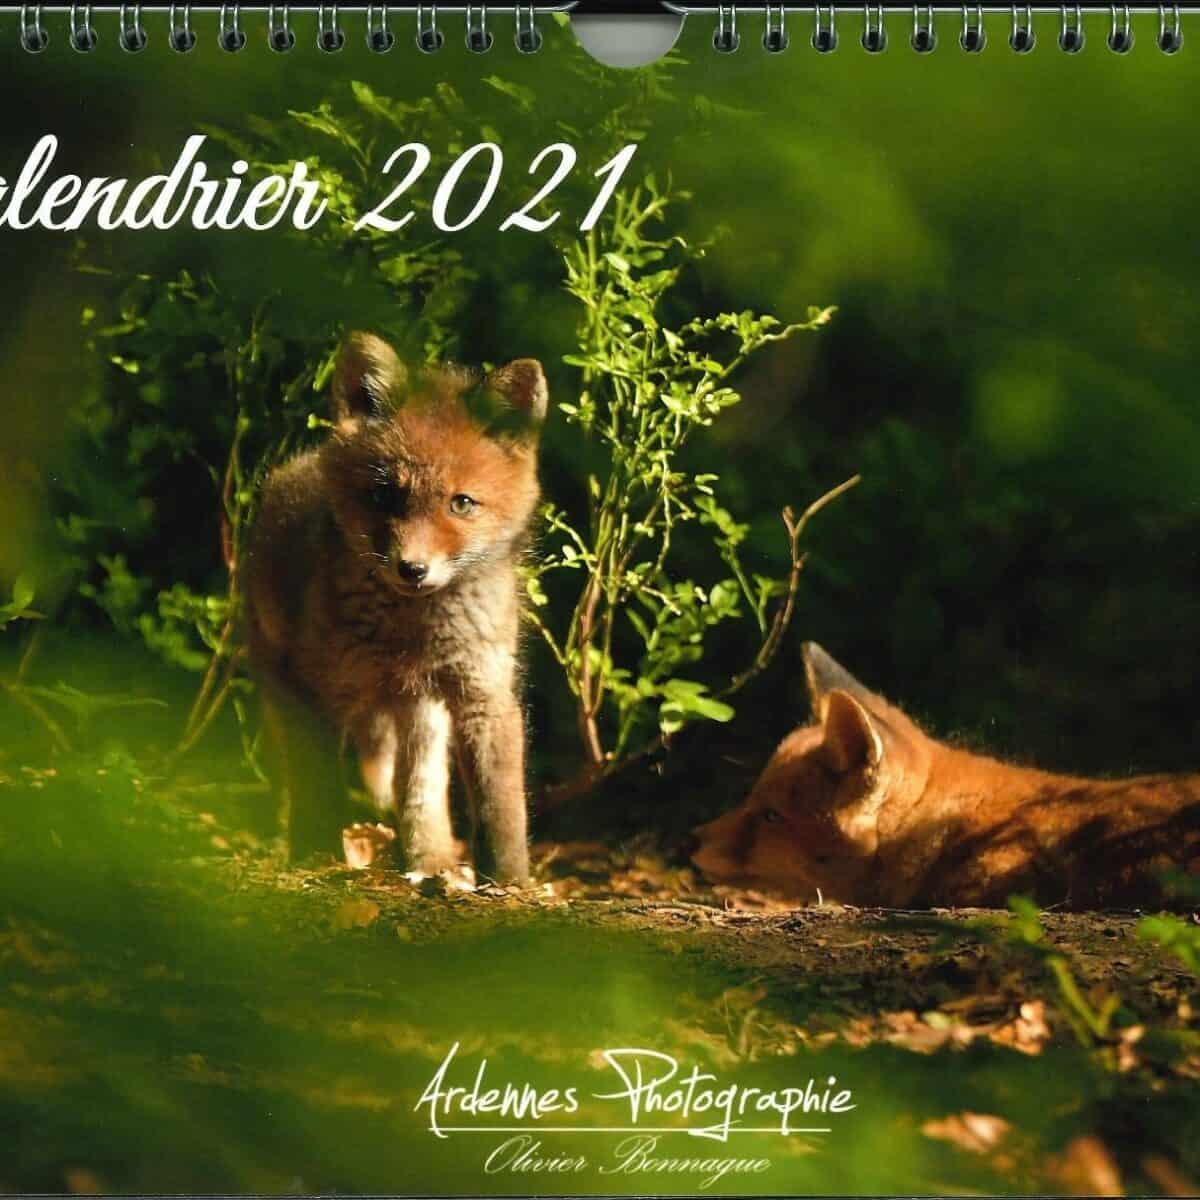 Calendrier Animalier 2021 (1)